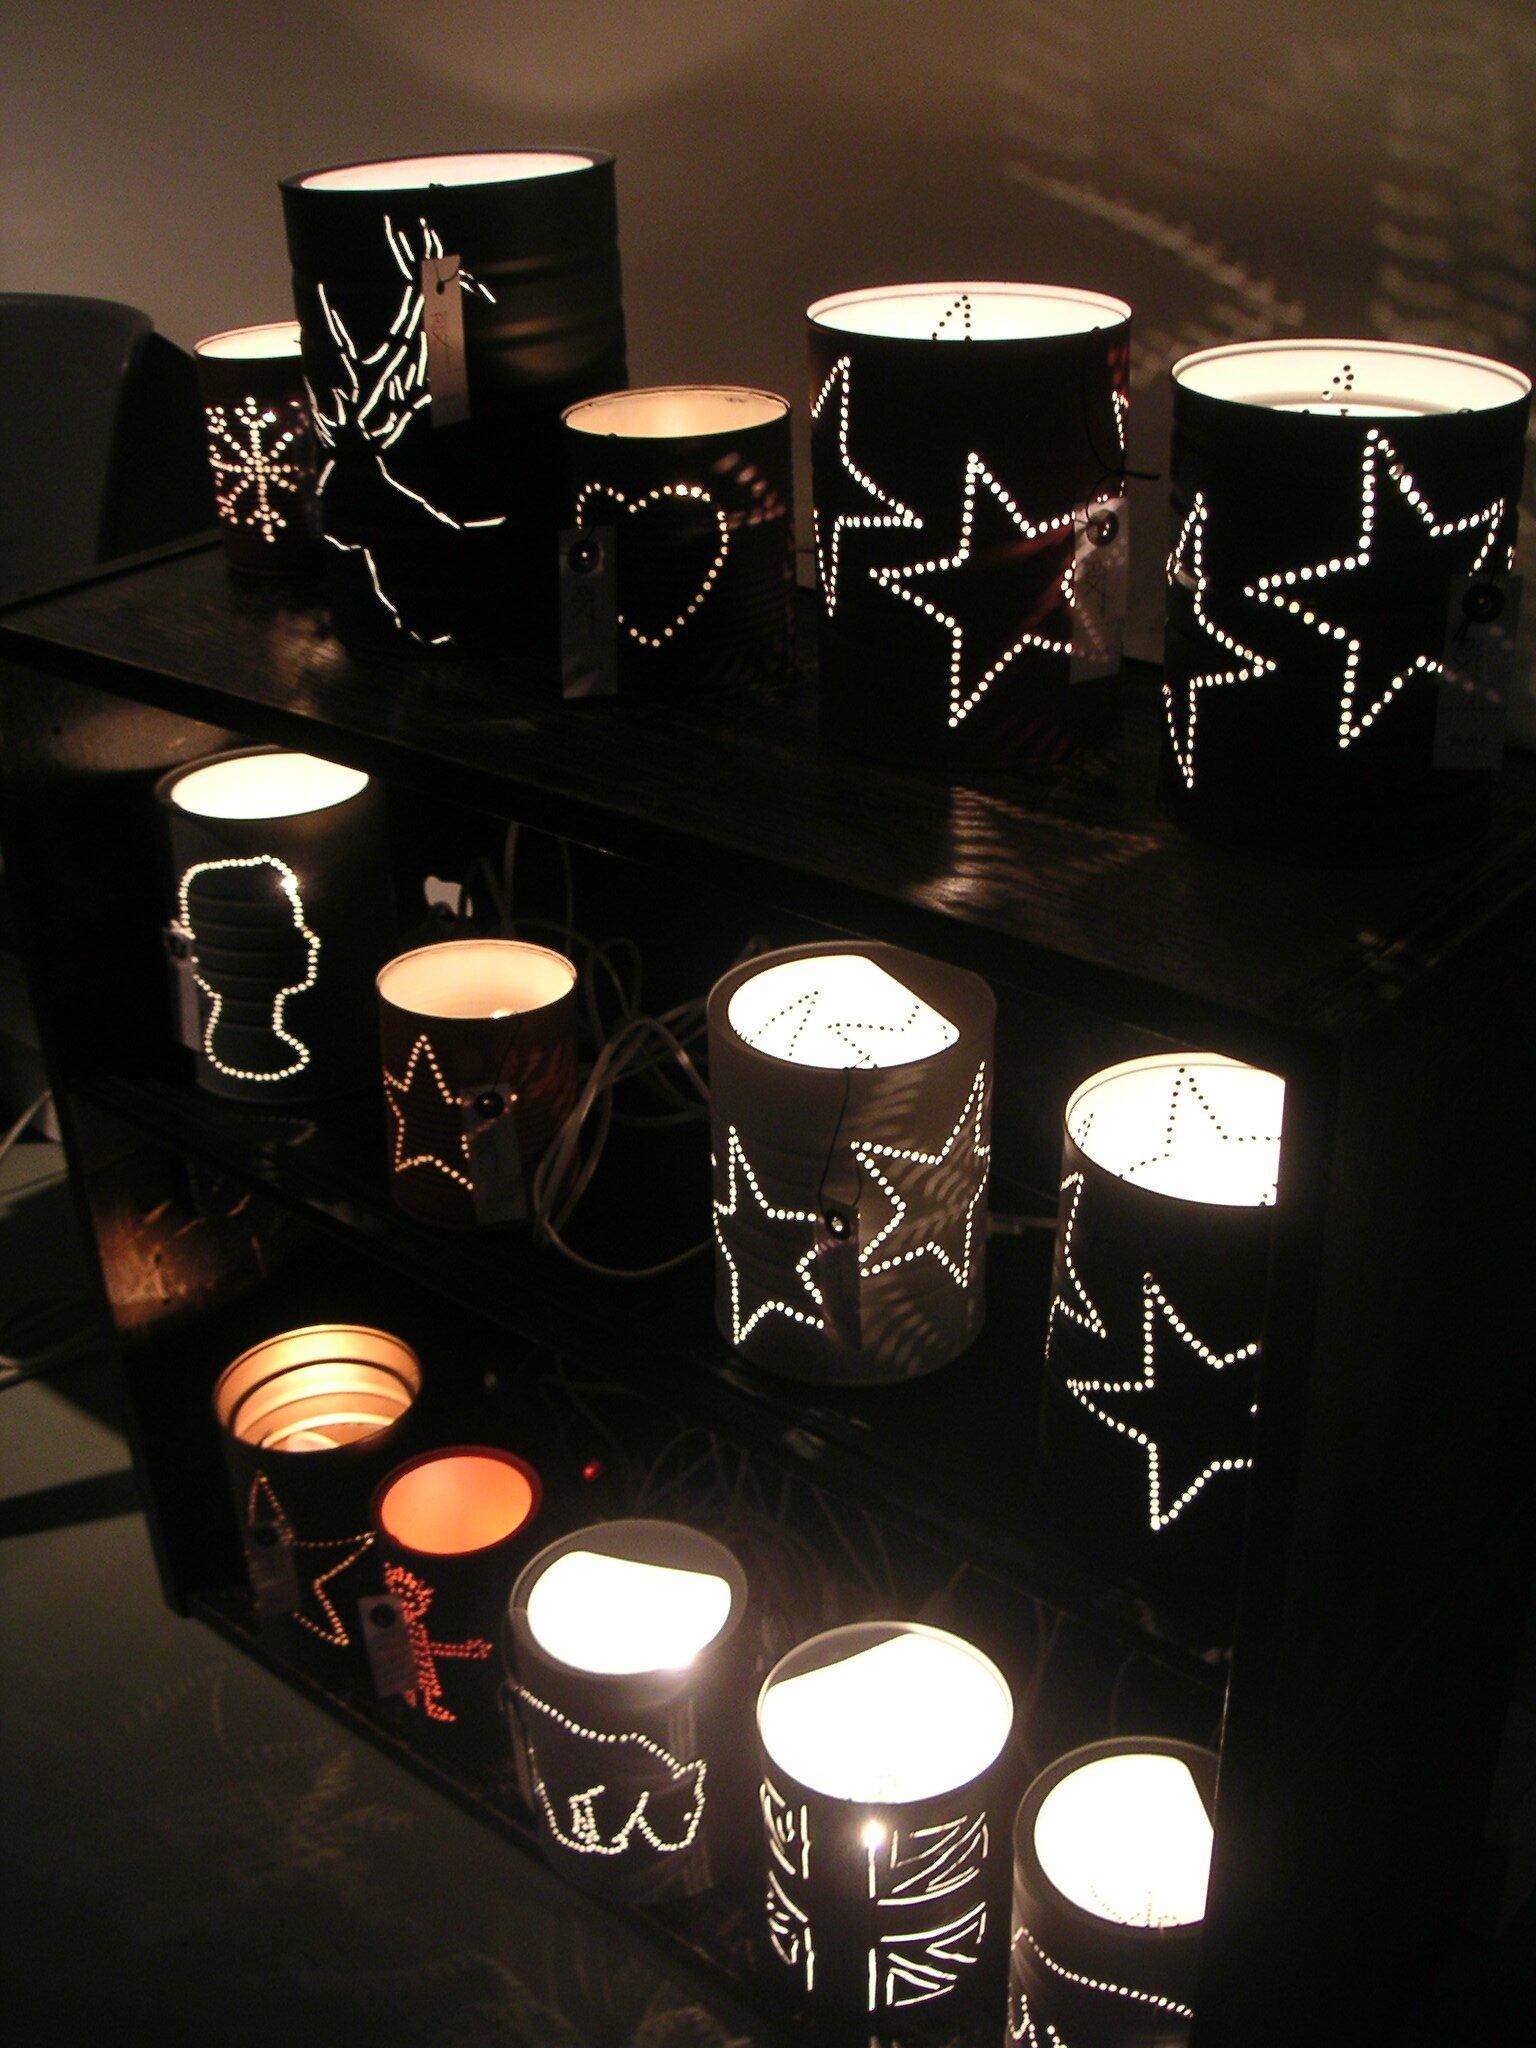 id art pitimana le blog. Black Bedroom Furniture Sets. Home Design Ideas